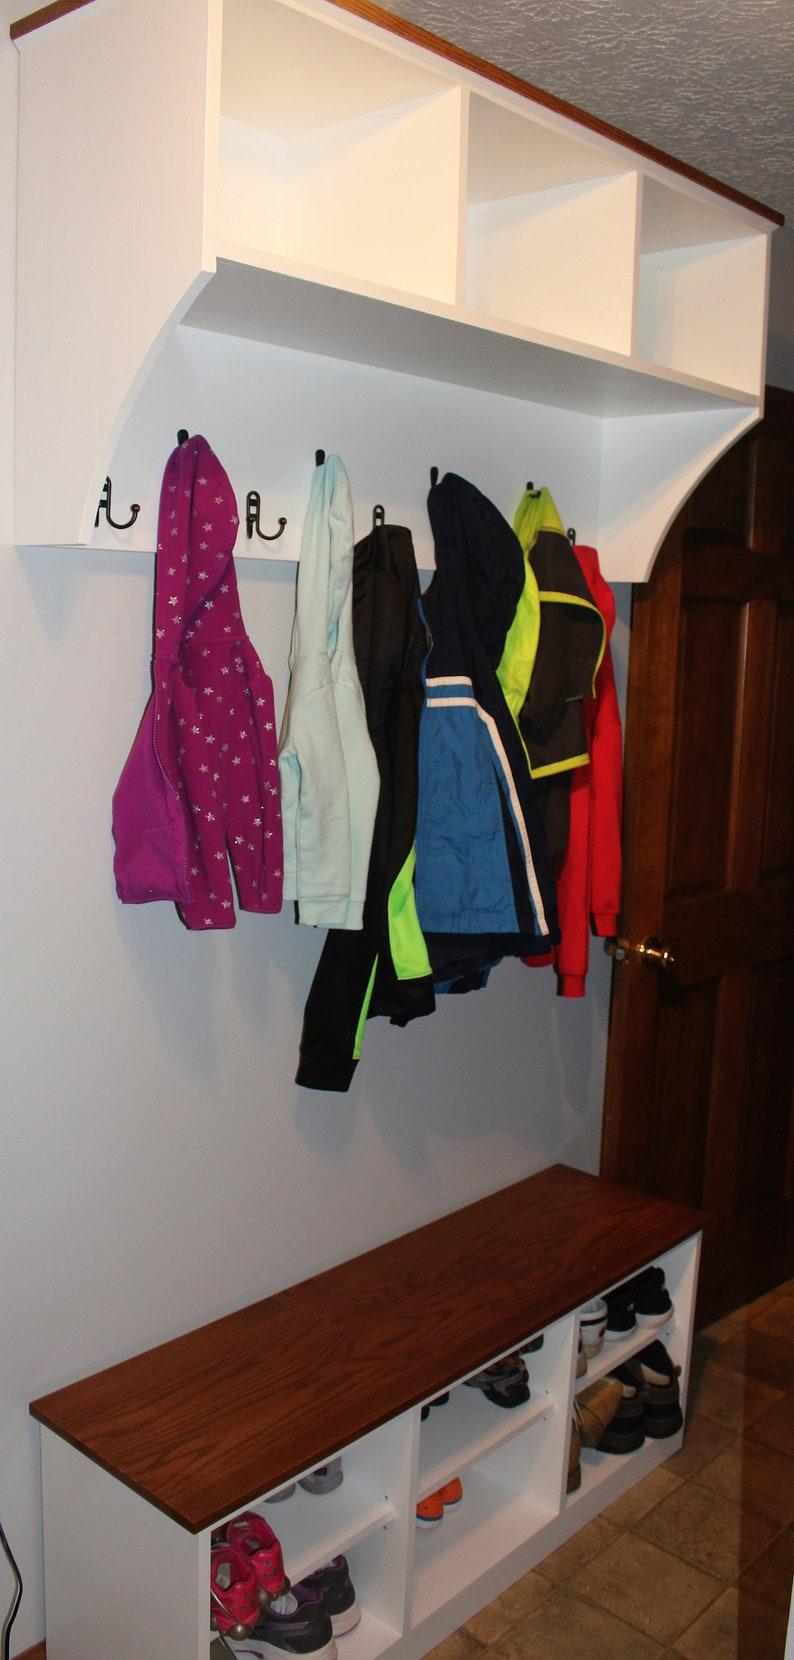 Hallway Bench Entryway Bench Shoe Rack or Shoe Shelf Shoe Bench works great as a Shoe Storage Bench